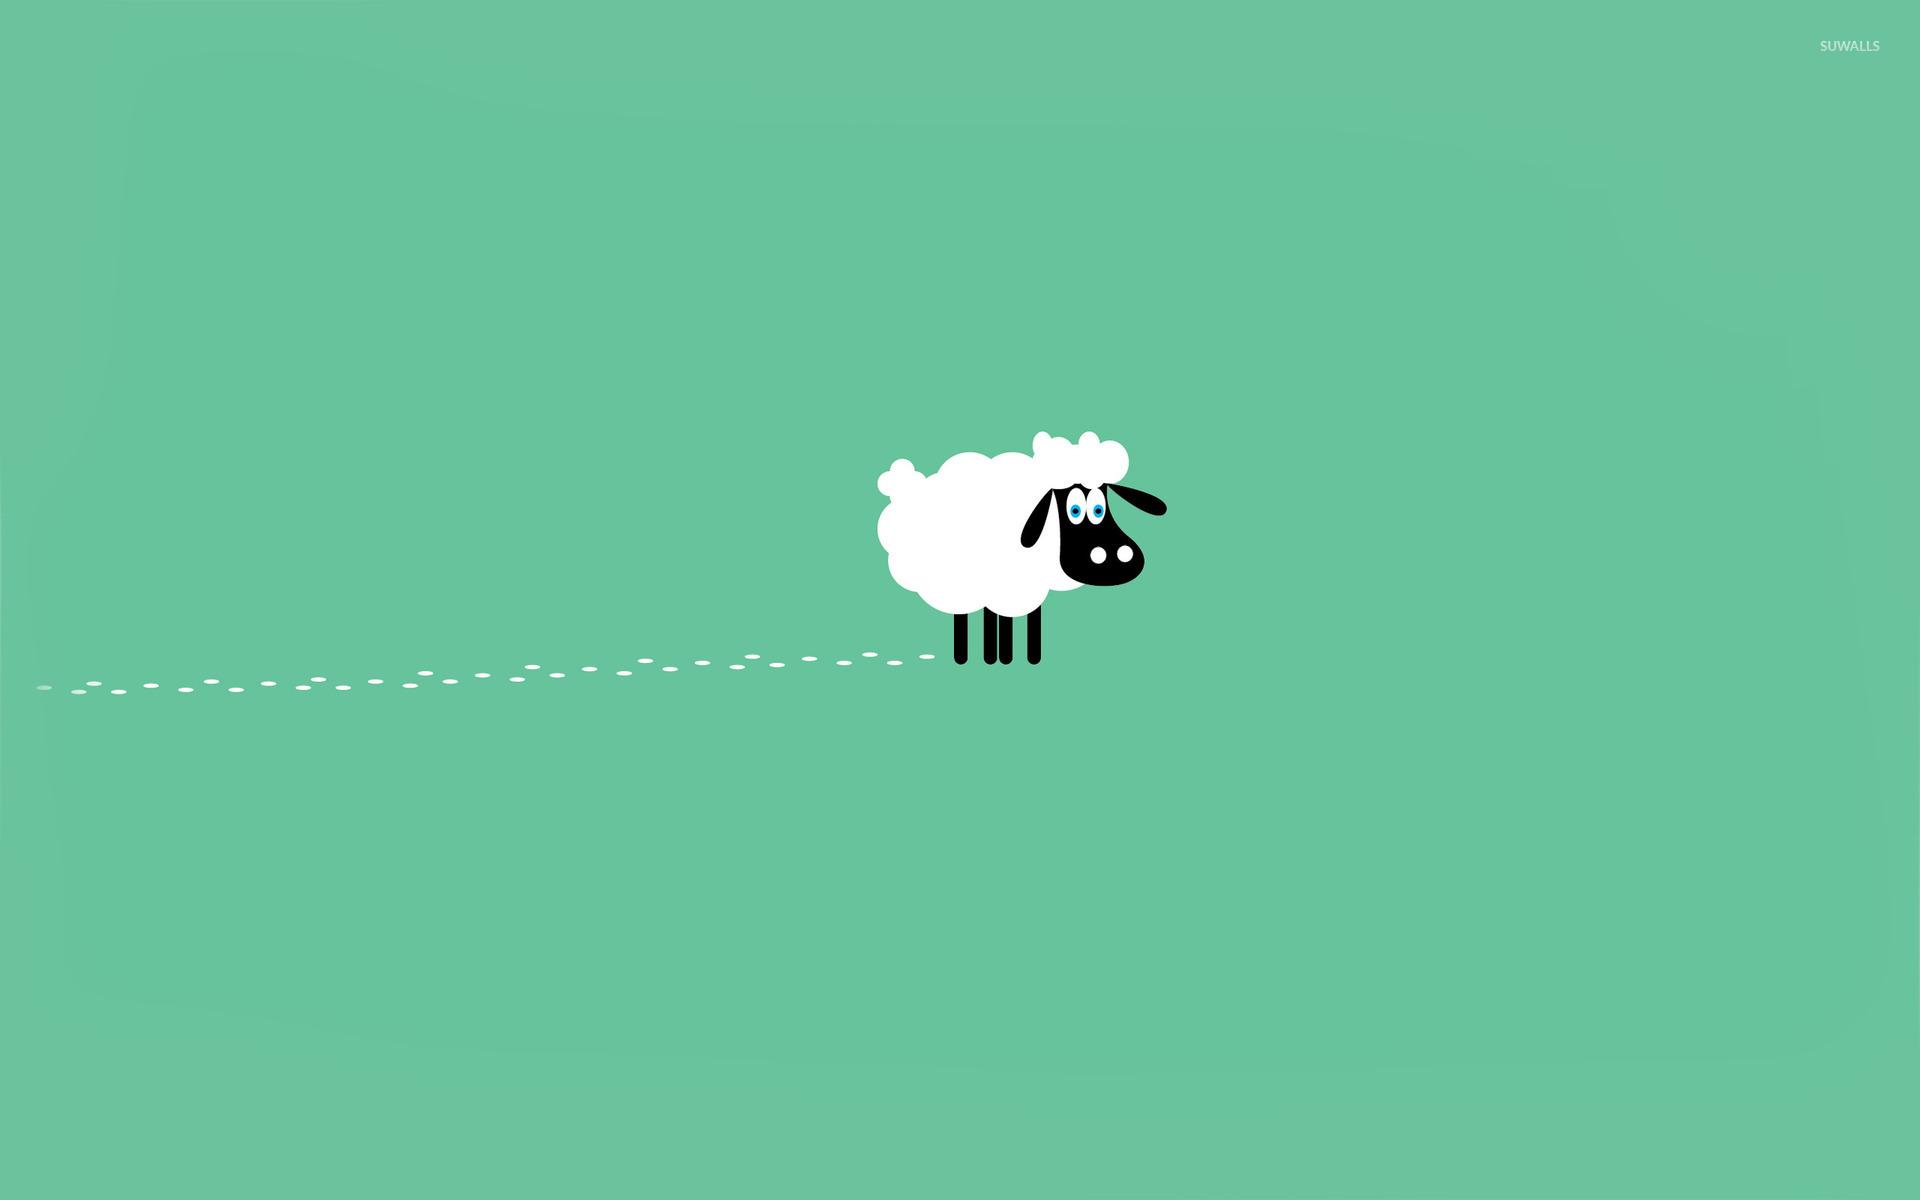 Game Of Thrones Quotes Desktop Wallpaper Sheep Footprints Wallpaper Minimalistic Wallpapers 20903